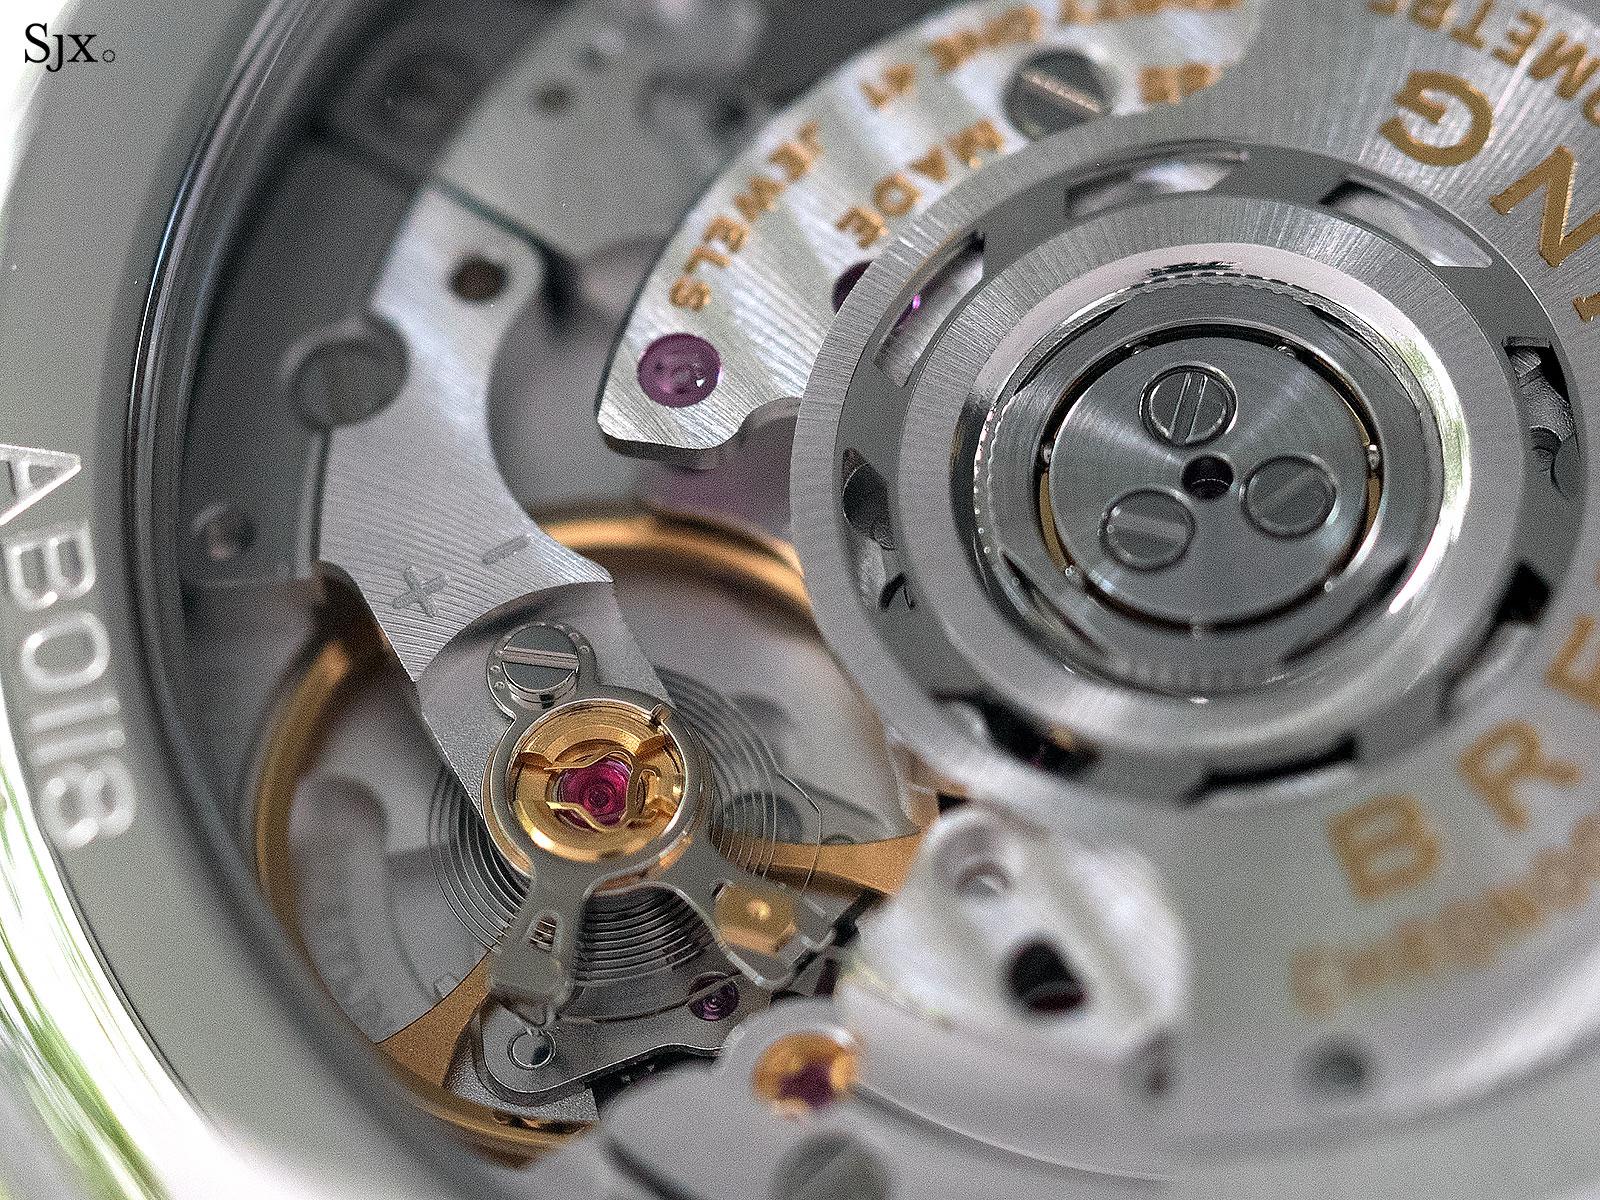 Breitling Premier B01 movement 5